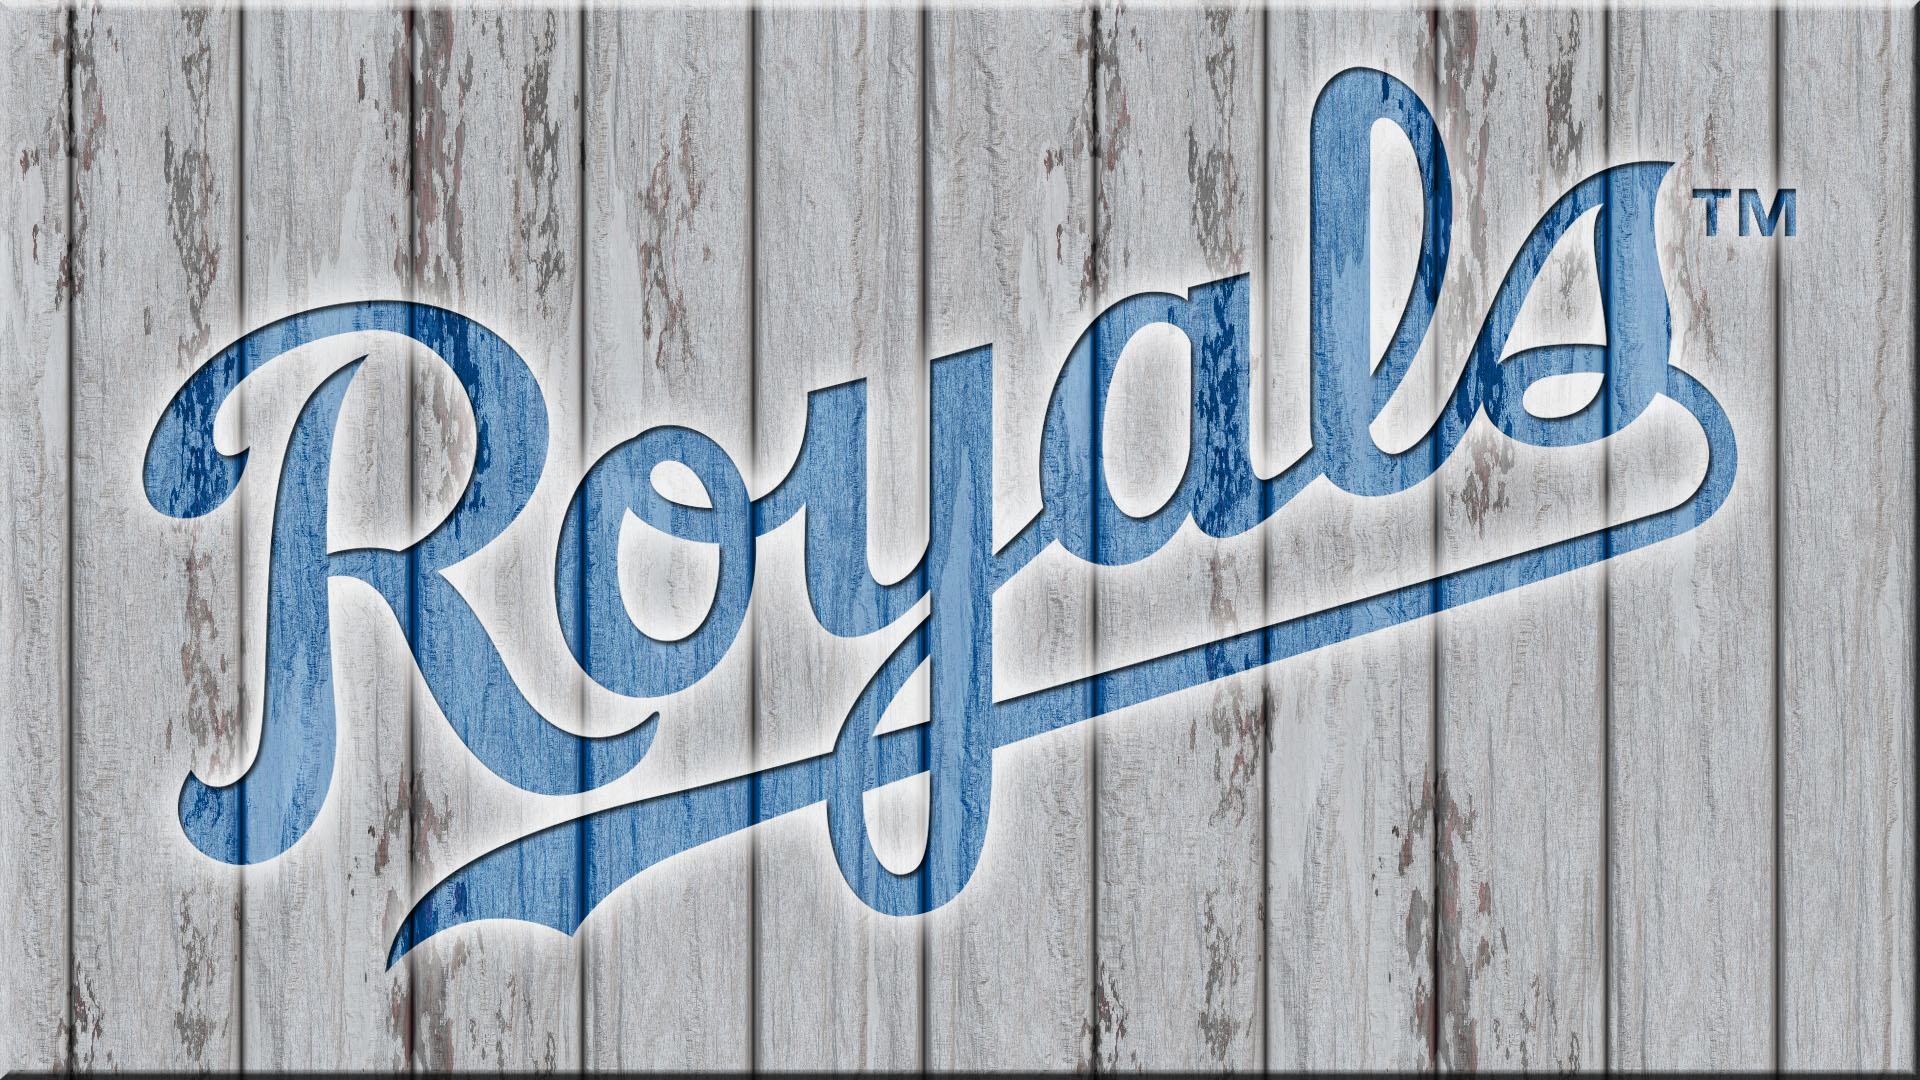 KANSAS CITY ROYALS mlb baseball 16 wallpaper 1920x1080 232208 1920x1080